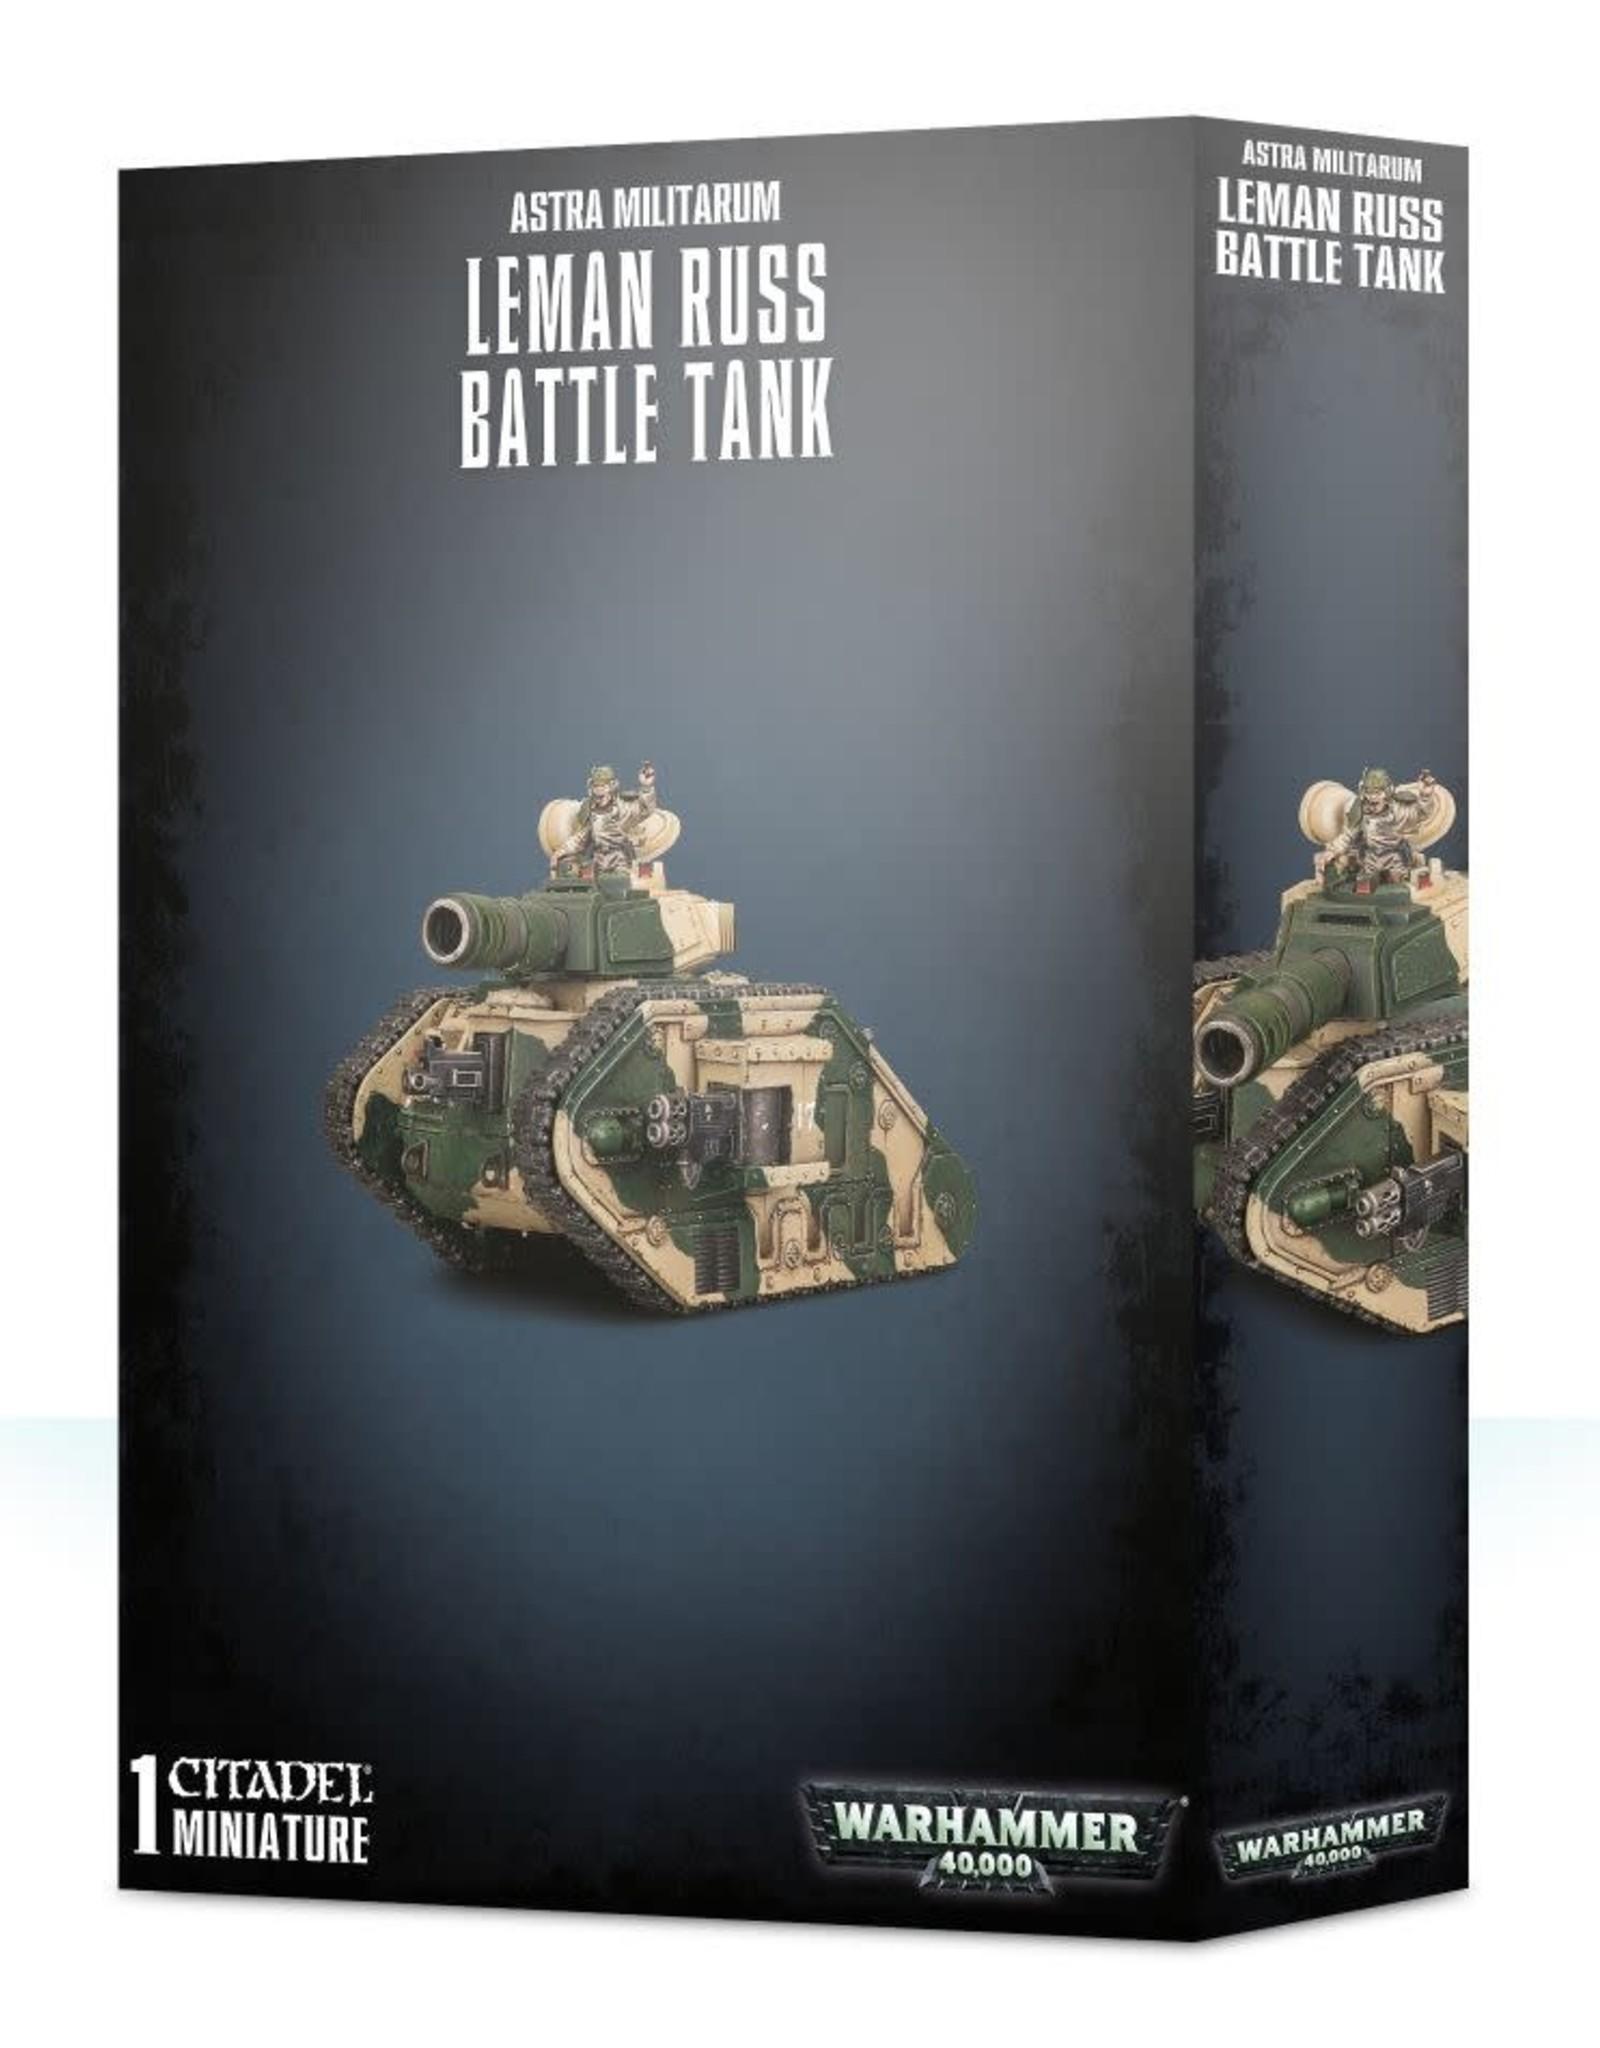 Warhammer 40K Astra Militarum Leman Russ Battle Tank